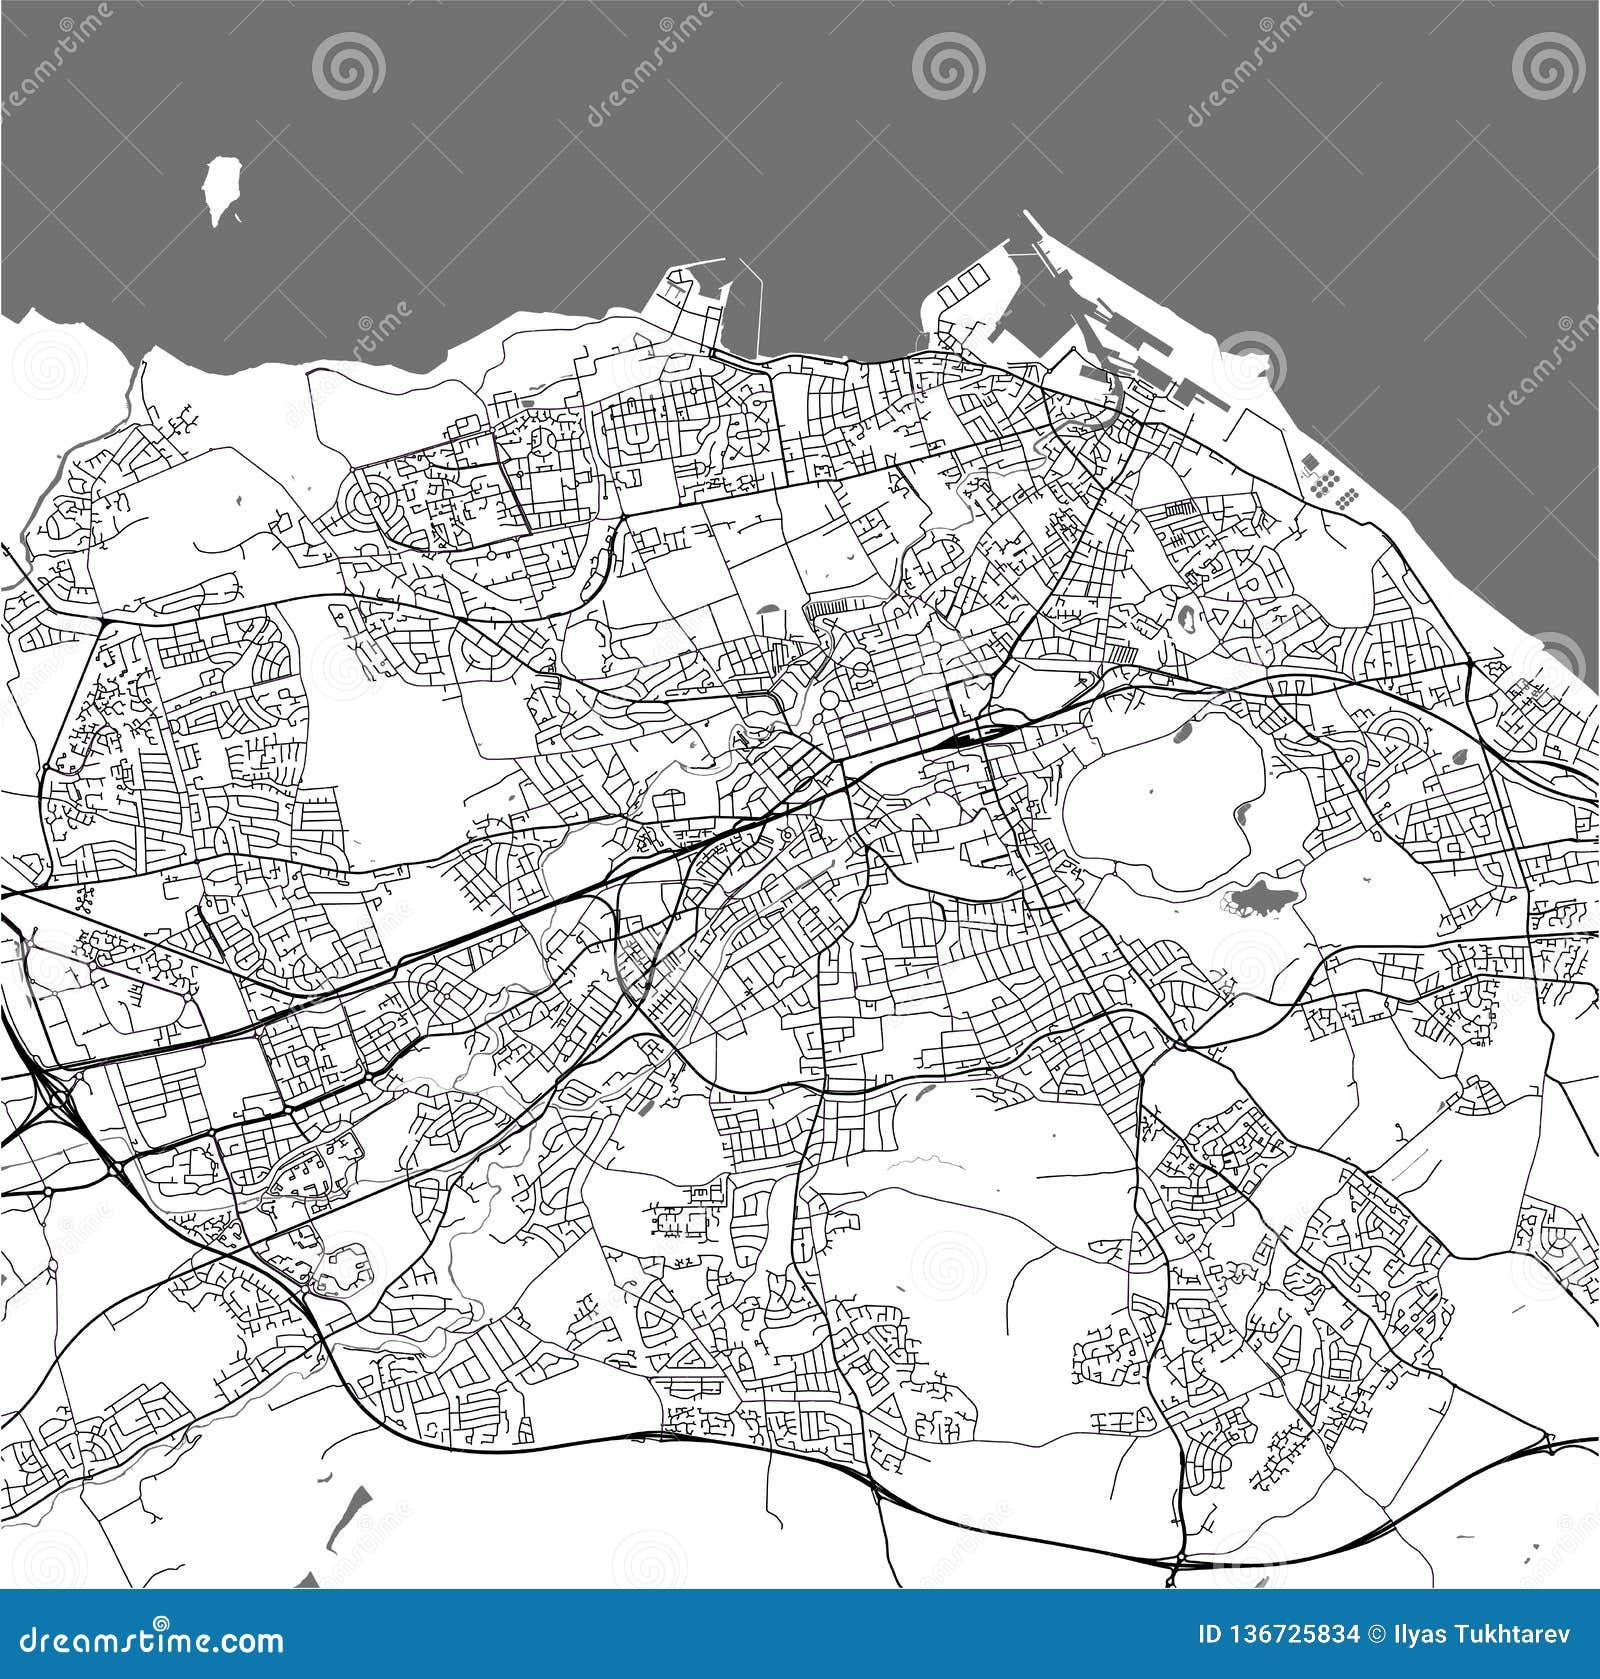 Map Of The City Of Edinburgh, Scotland, United Kingdom Stock ...